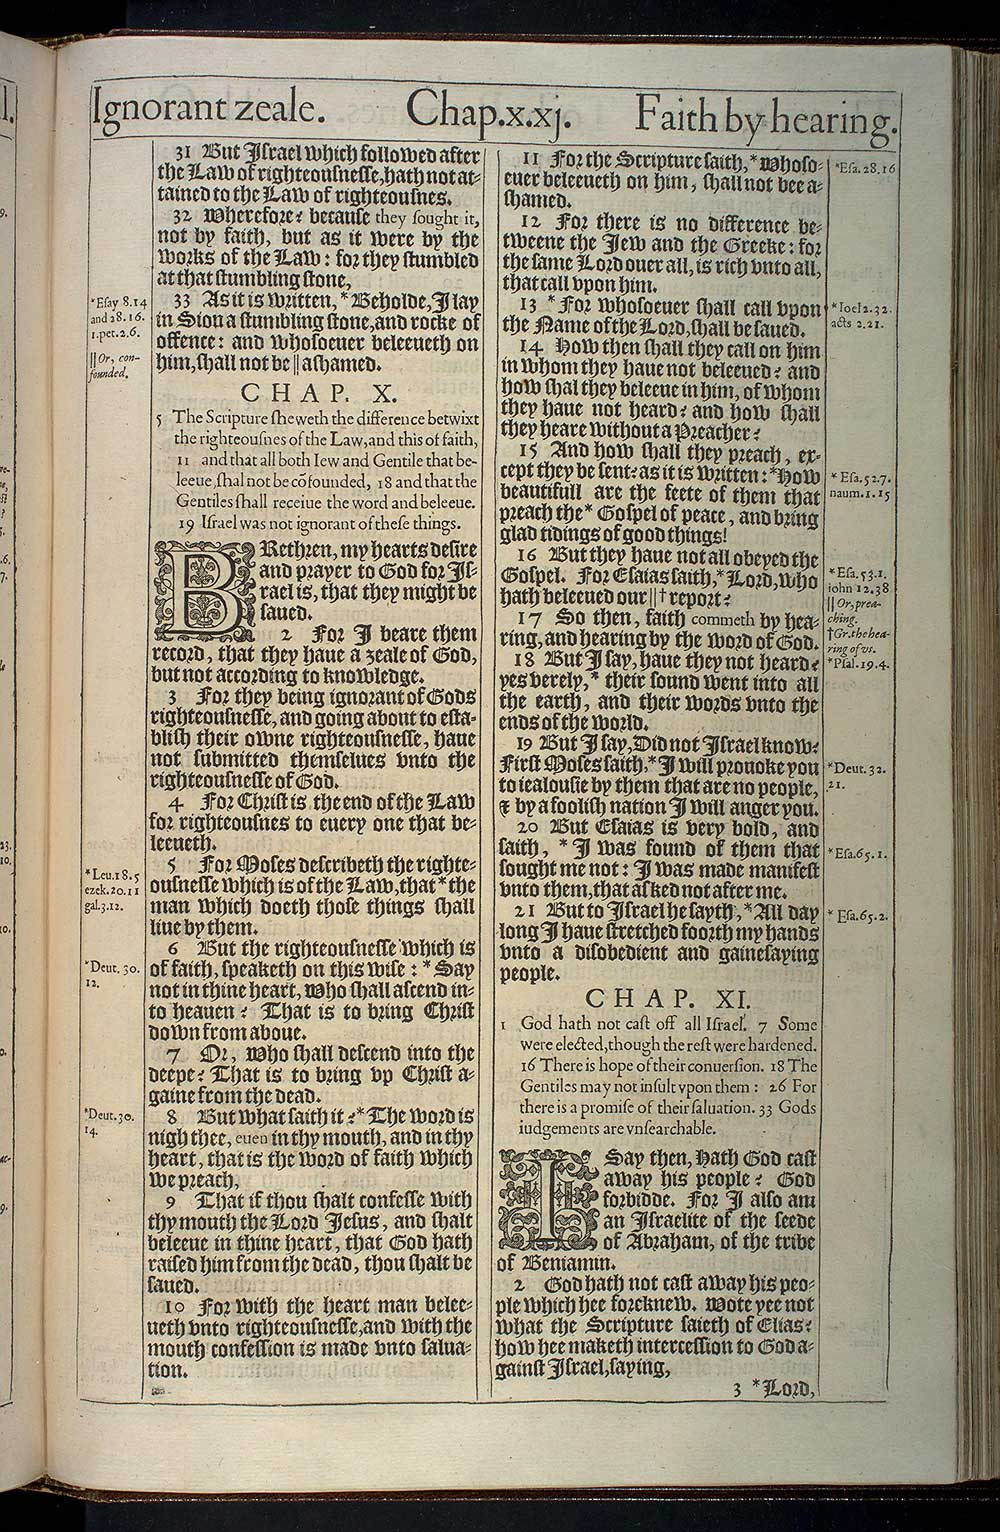 Romans Chapter 11 Original 1611 Bible Scan